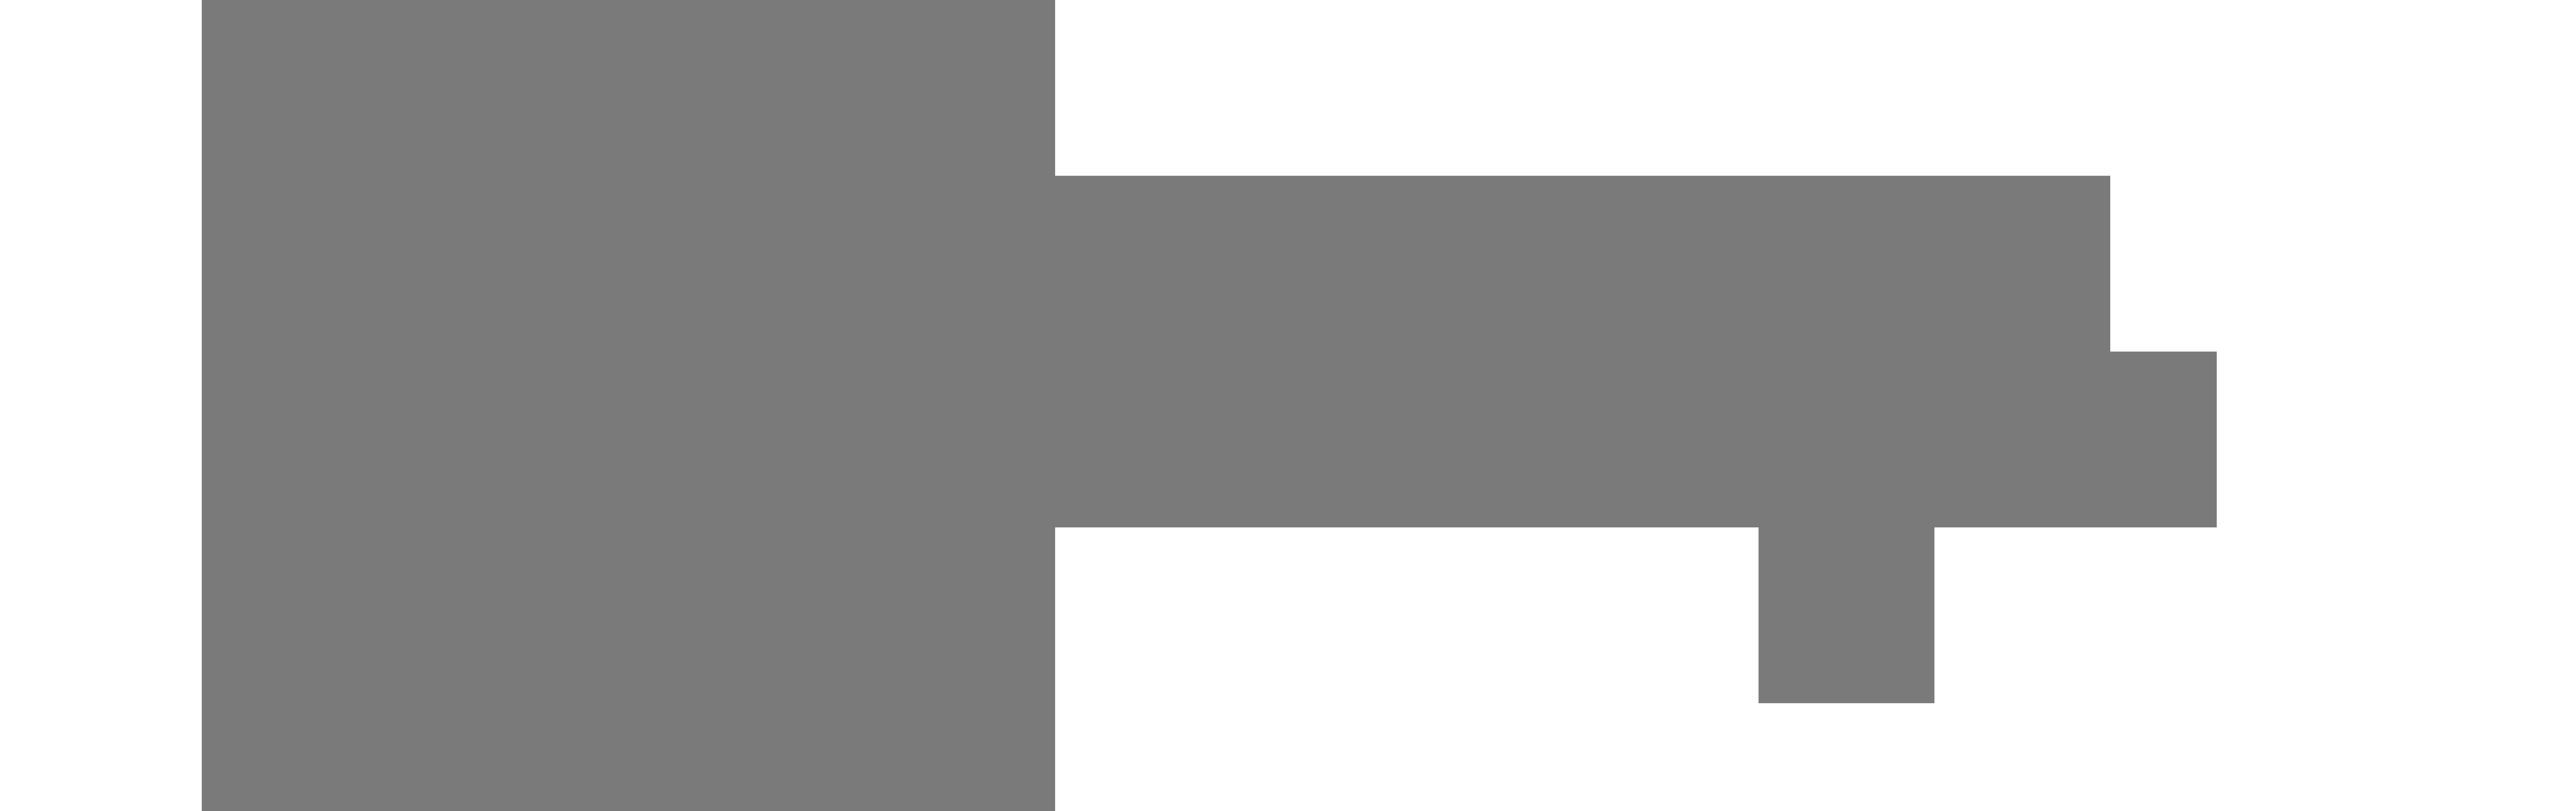 Logo Mittendrin im Wuhletal gGmbH